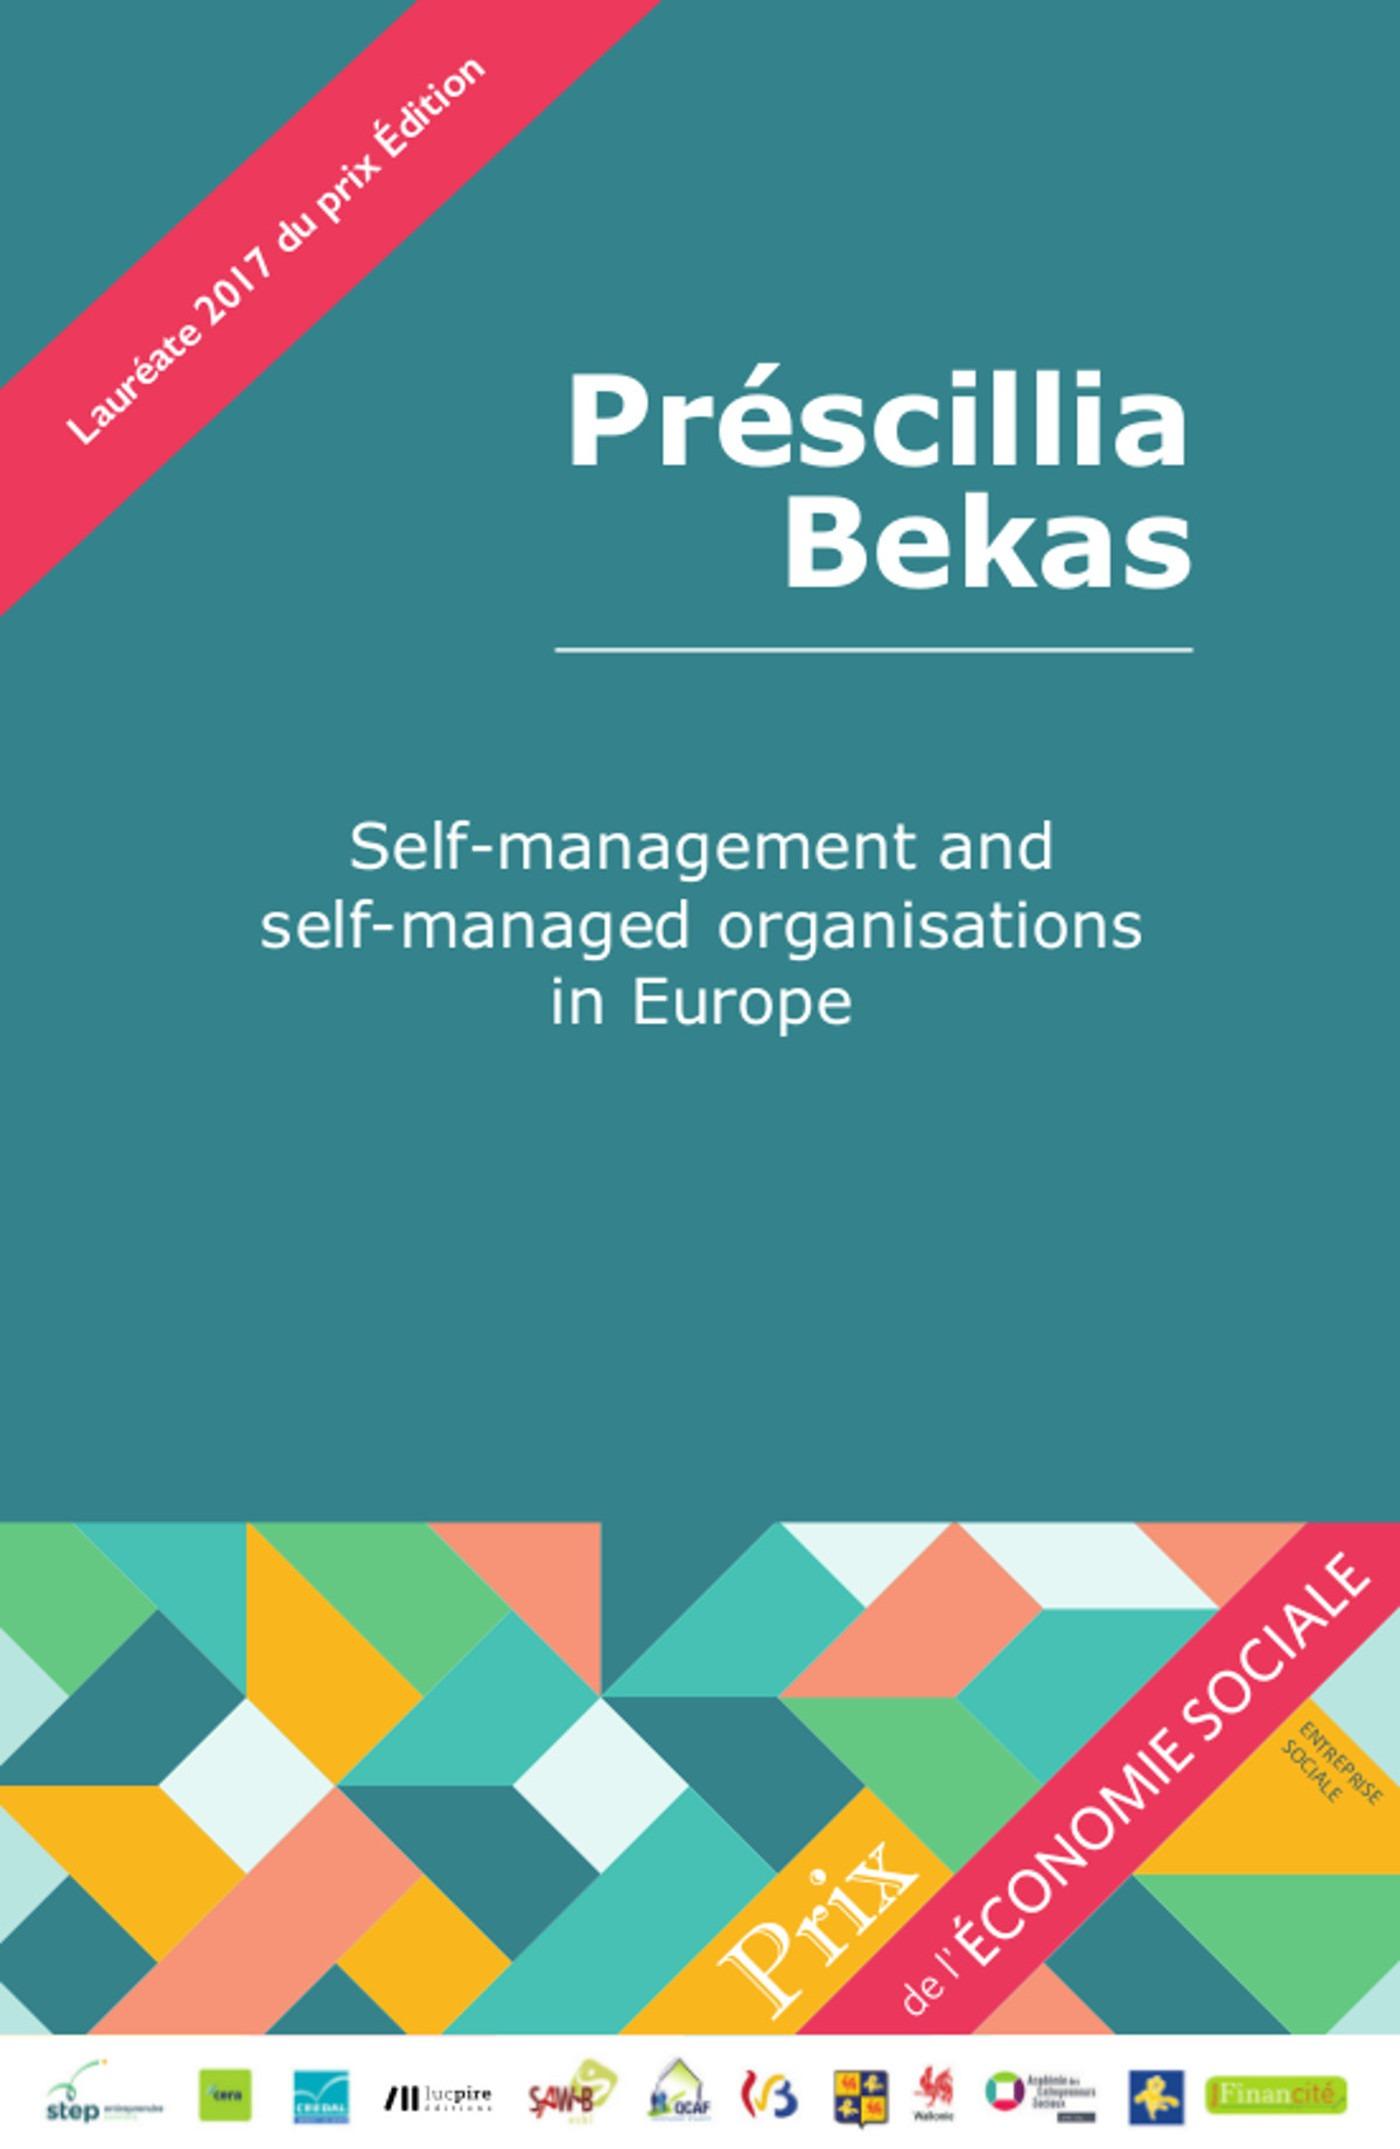 Préscillia Bekas TFE 2017 - Self-management and self-managed organisations in Europe